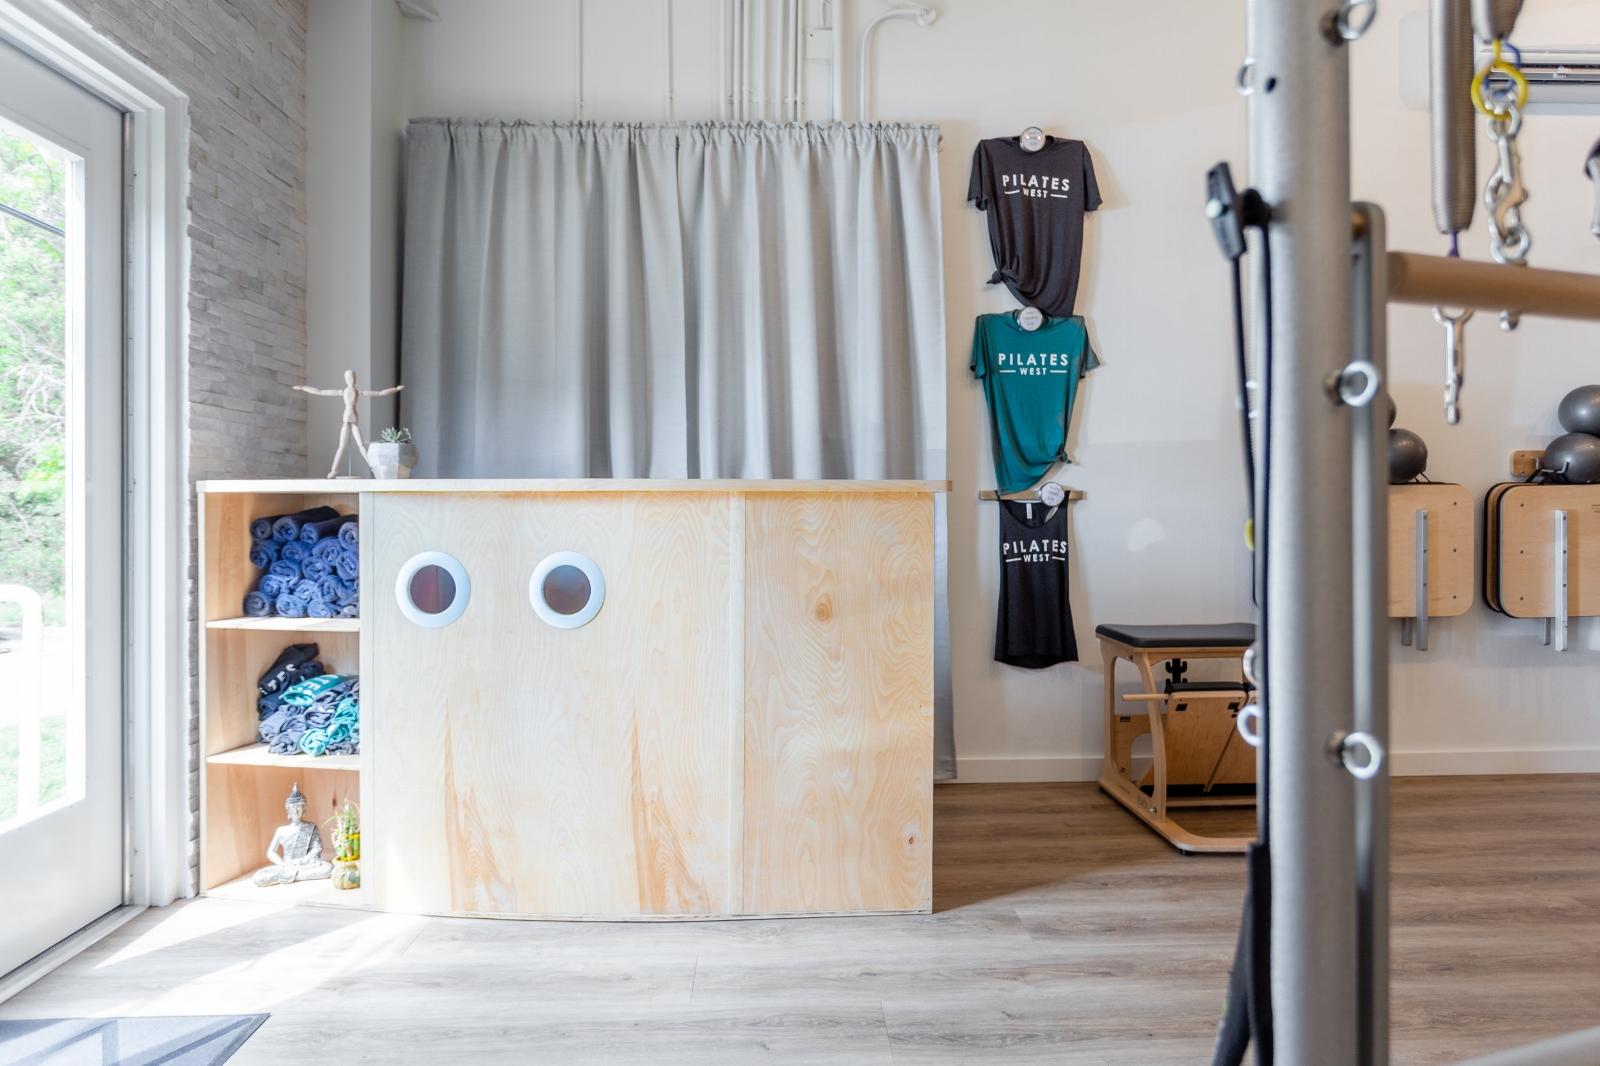 love-ding-blog-pilates-west-commercial-interior-designer-austin-texas.jpg